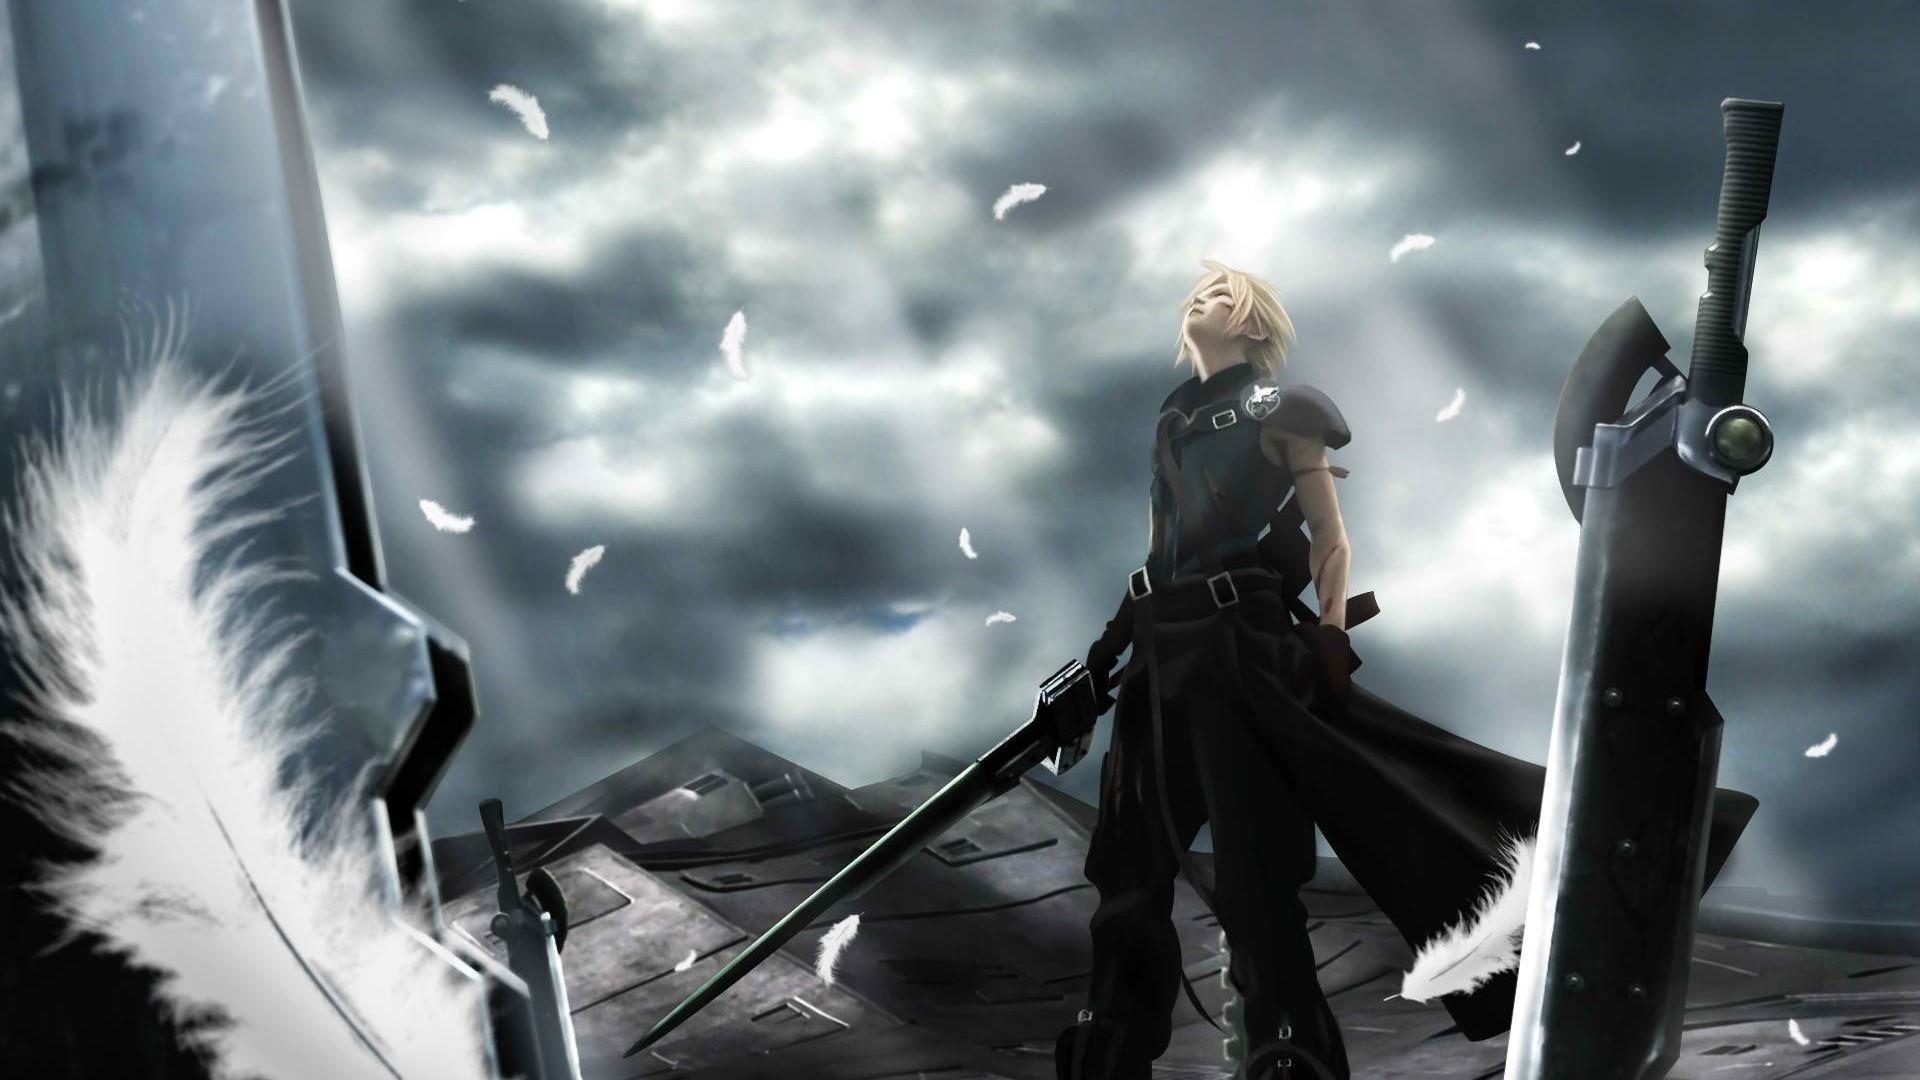 Final Fantasy 7 Wallpaper HD (78+ images)